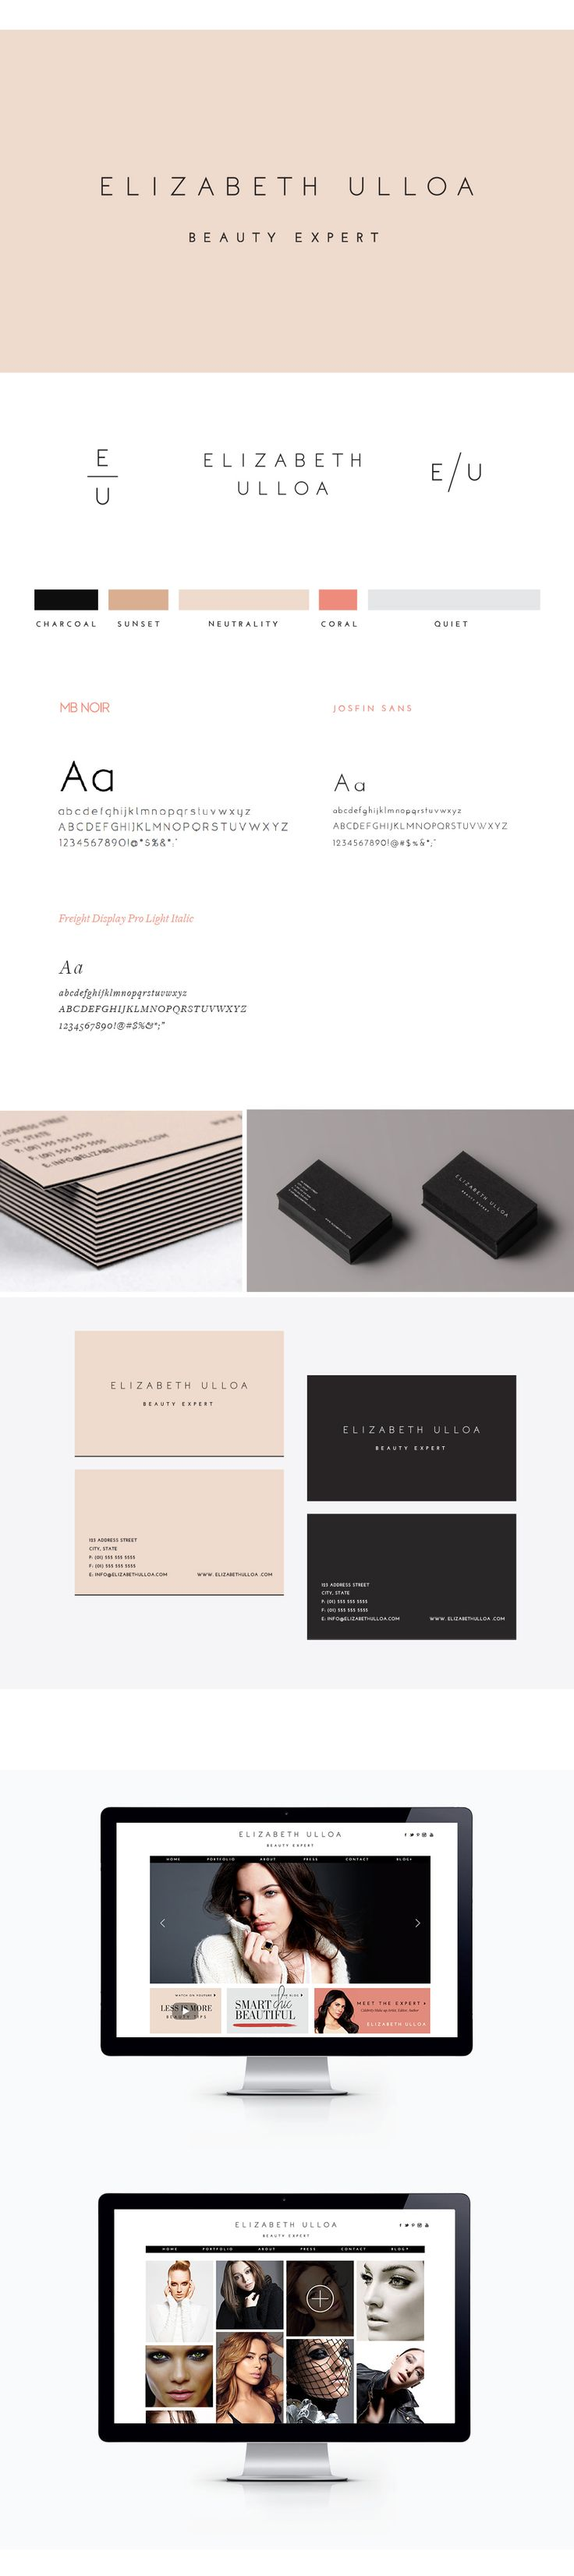 Elizabeth Ulloa Branding, by Julia Kostreva